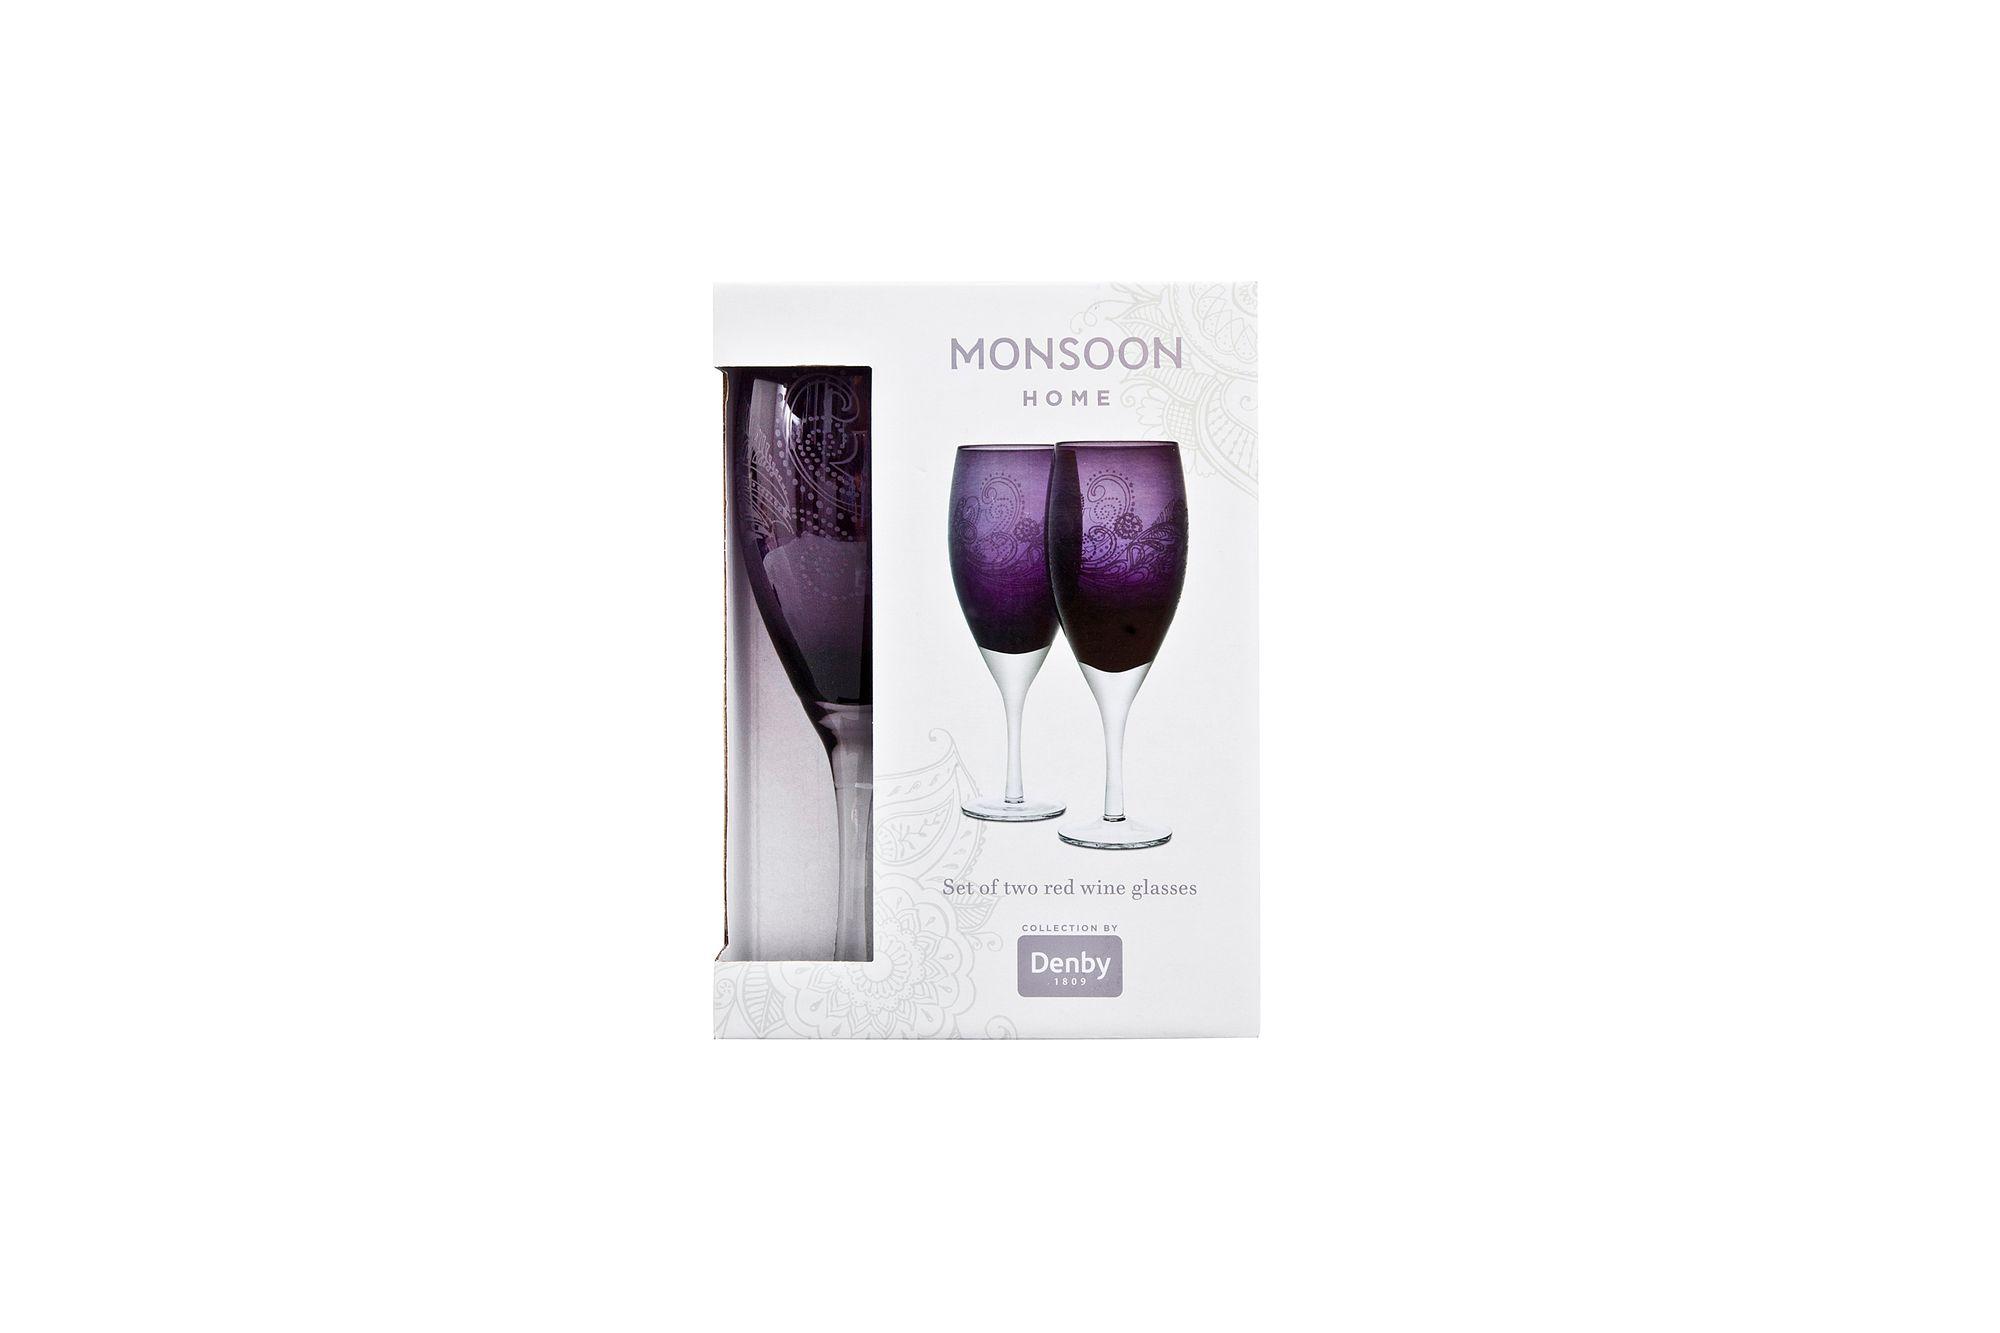 Denby Monsoon Cosmic Pair of Red Wine Glasses thumb 1